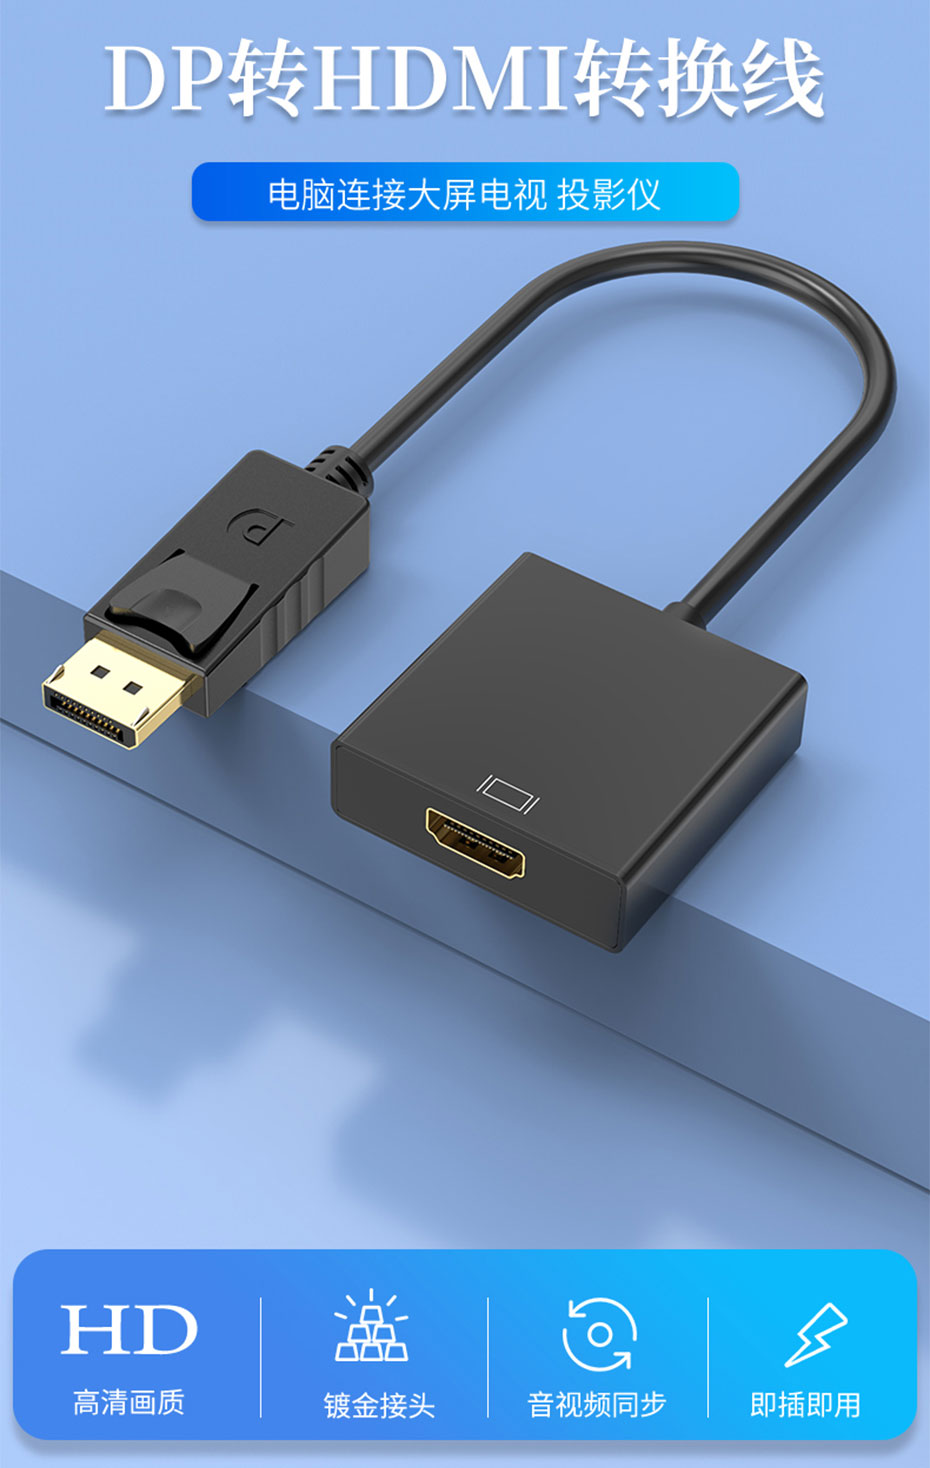 DP转HDMI转换器DH